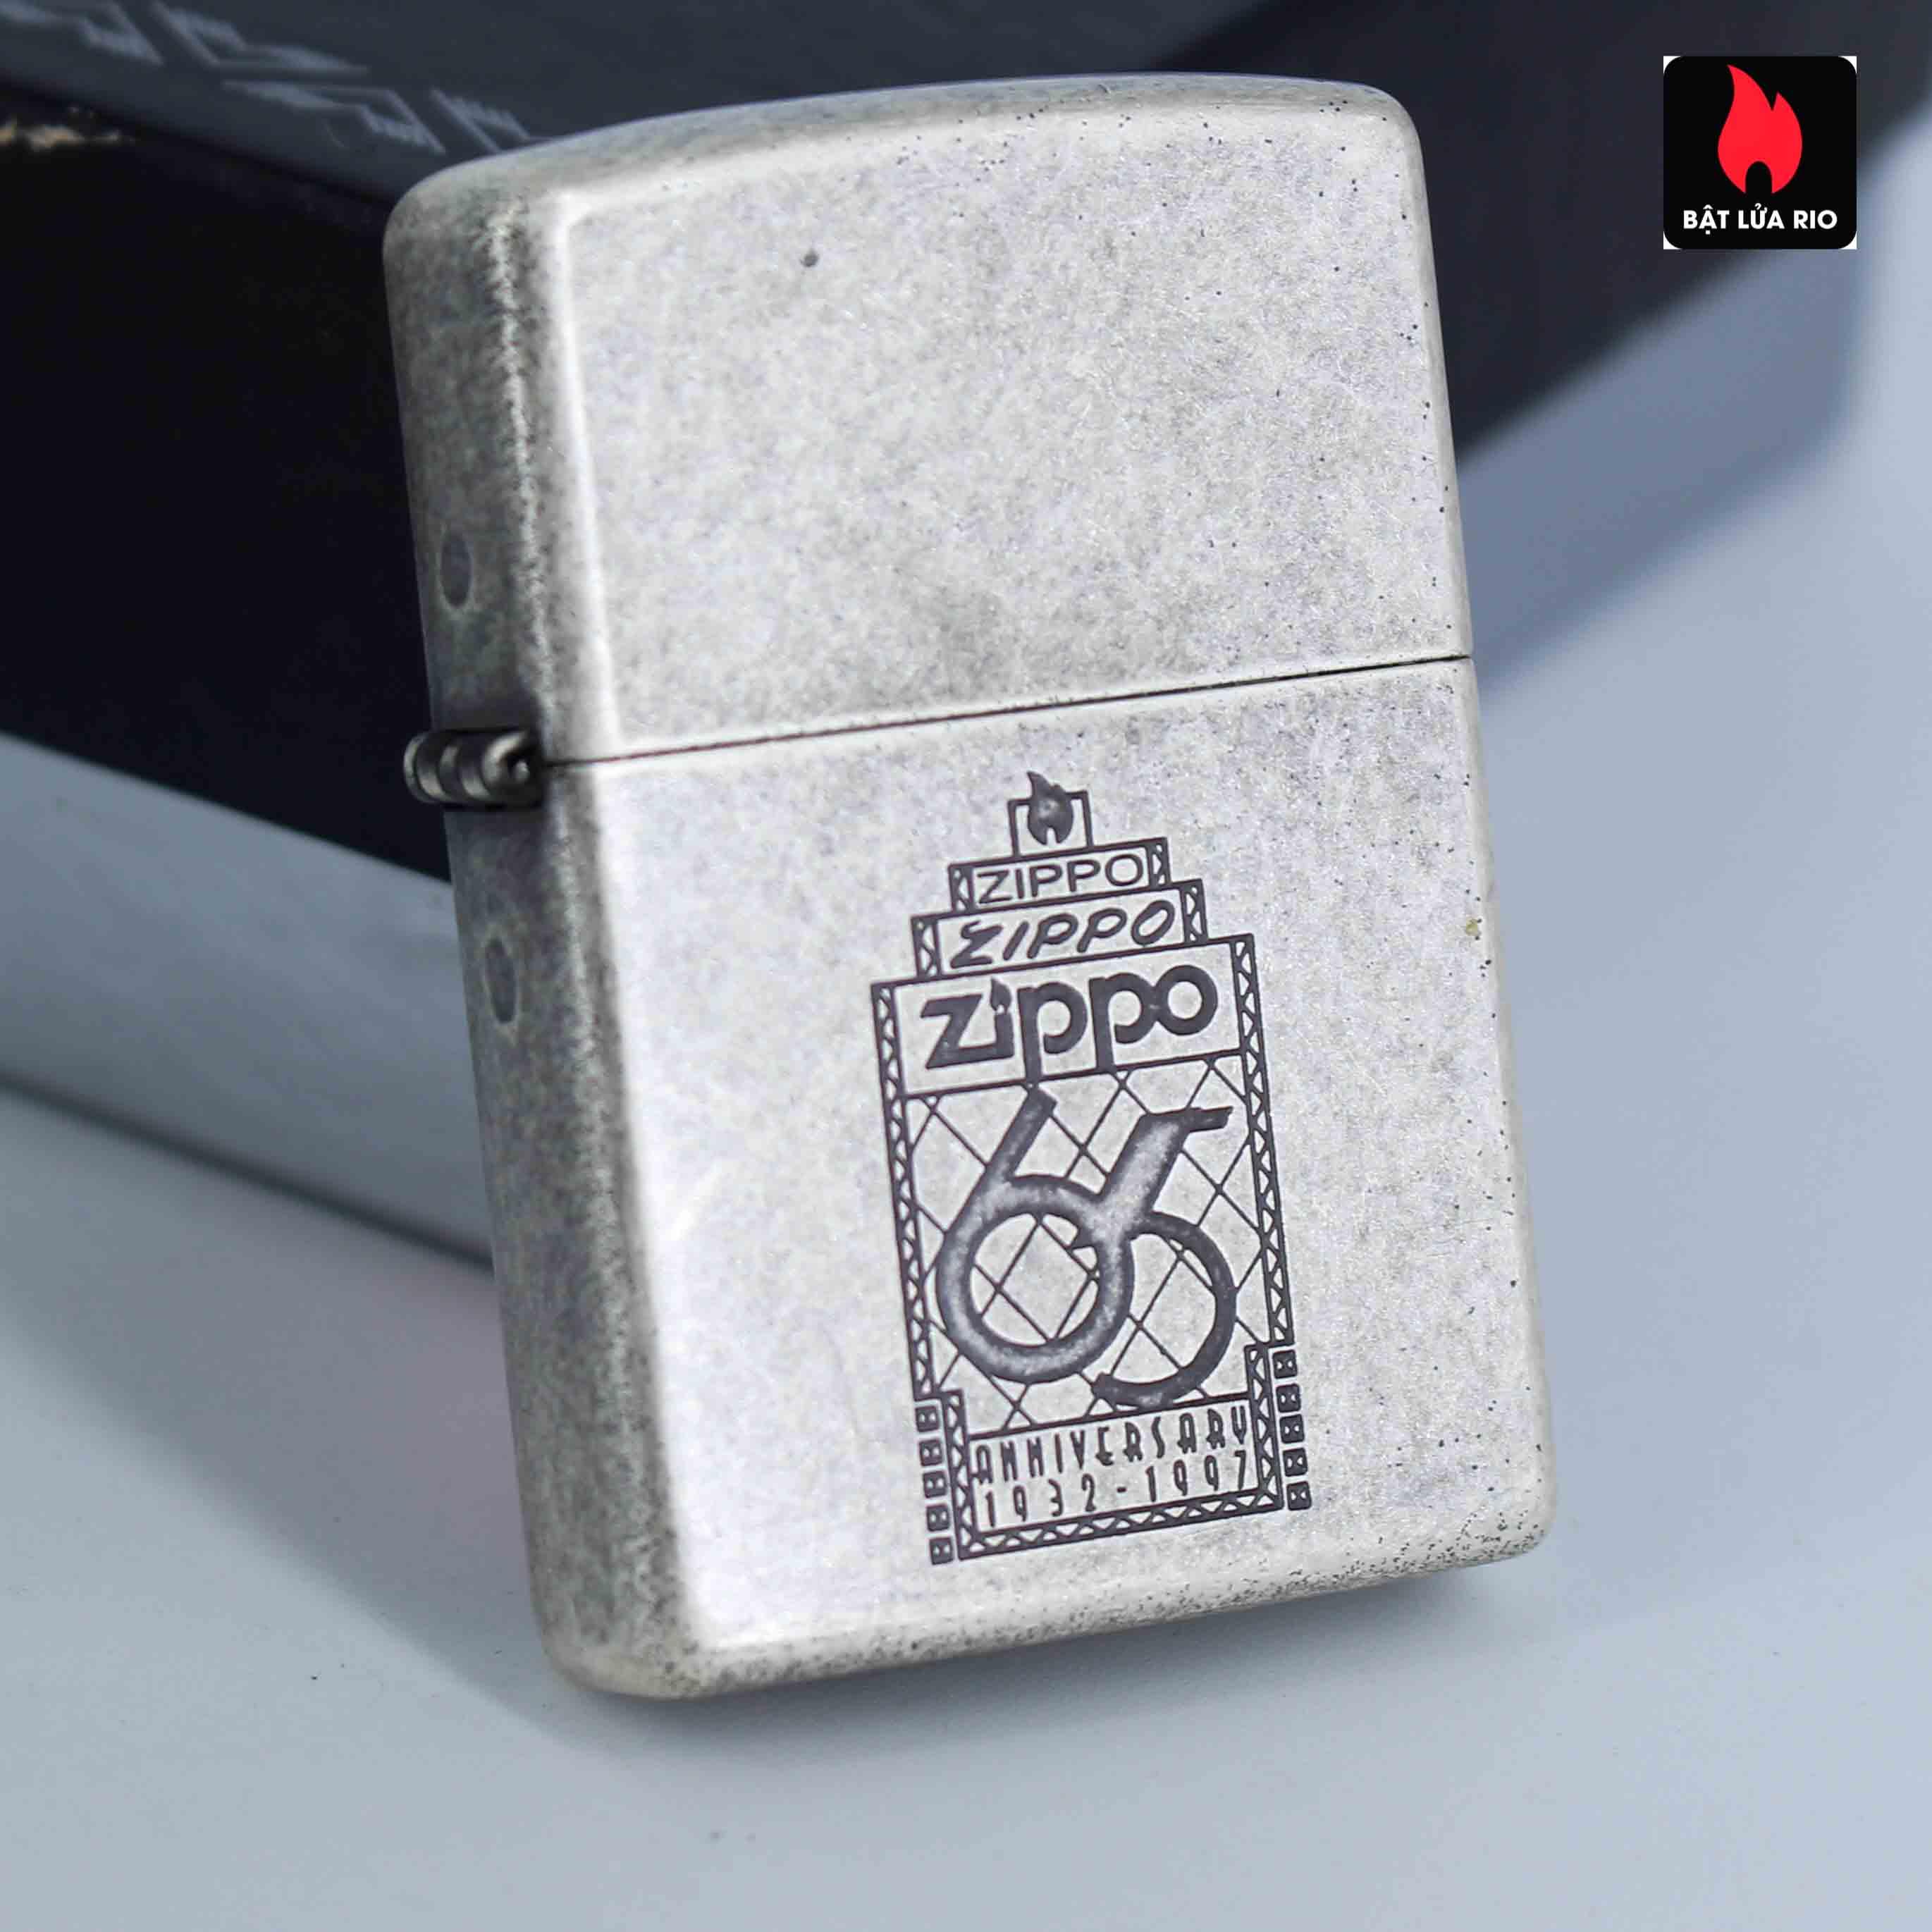 Zippo La Mã 1997 - 65th Anniversary - Employee 5